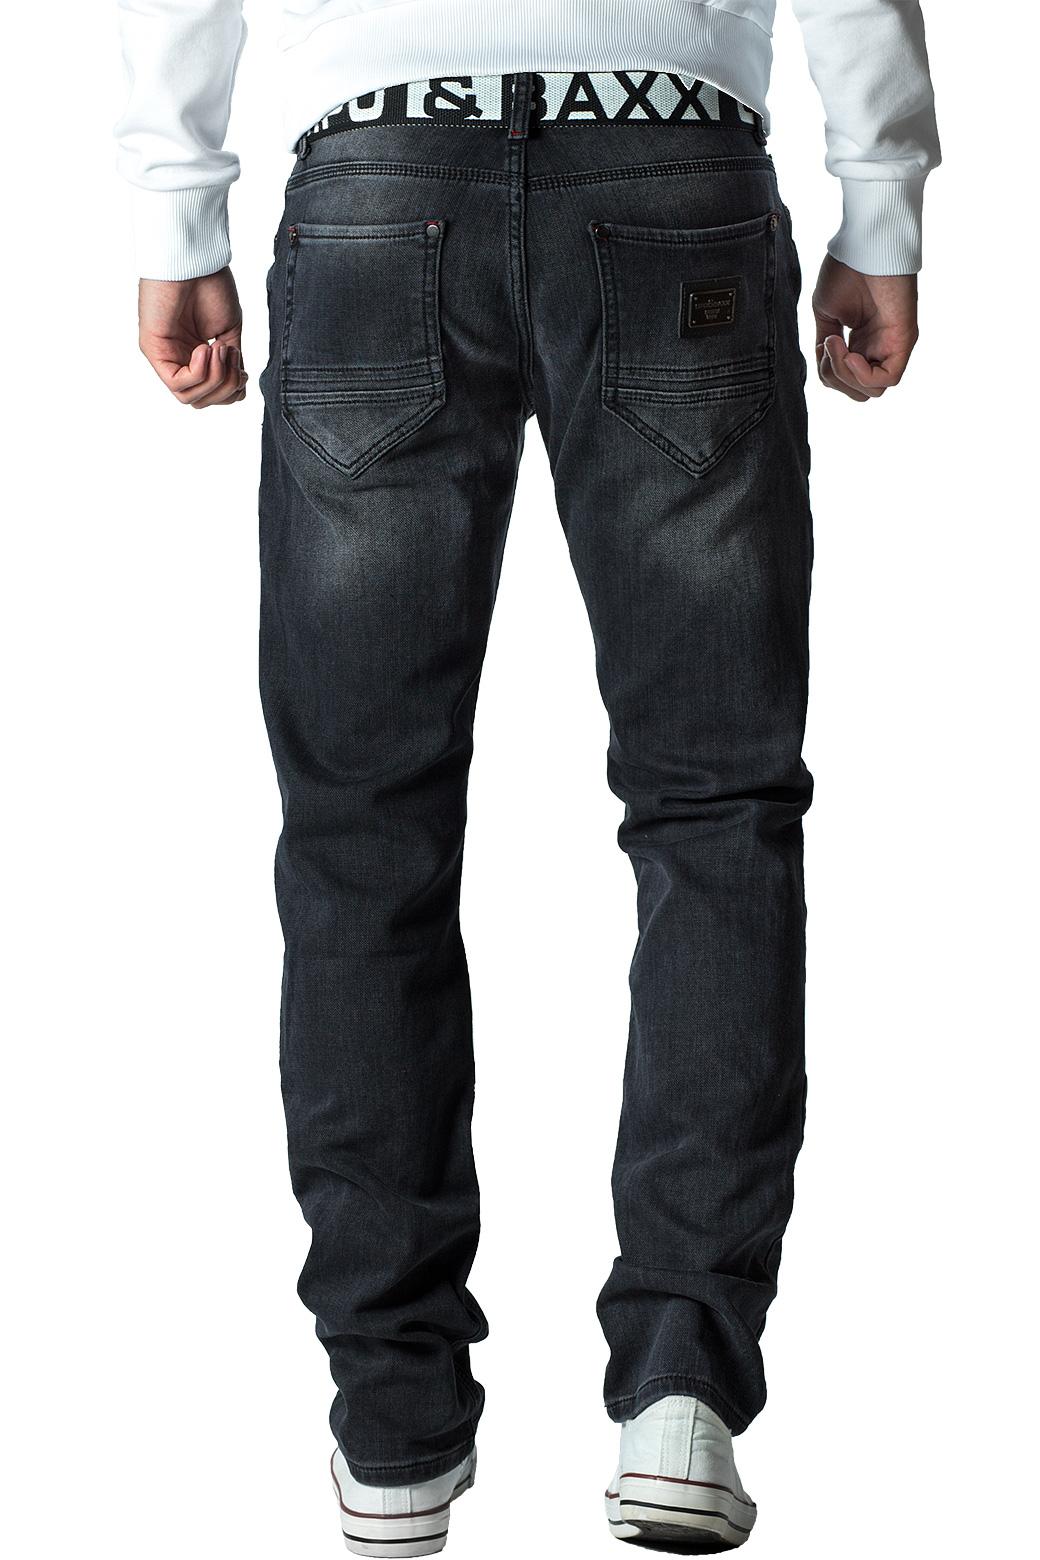 Cipo-amp-Baxx-Uomo-Jeans-Pantaloni-ricamate-Biker-Style-streetwear-nervature-pattern-Dope miniatura 25